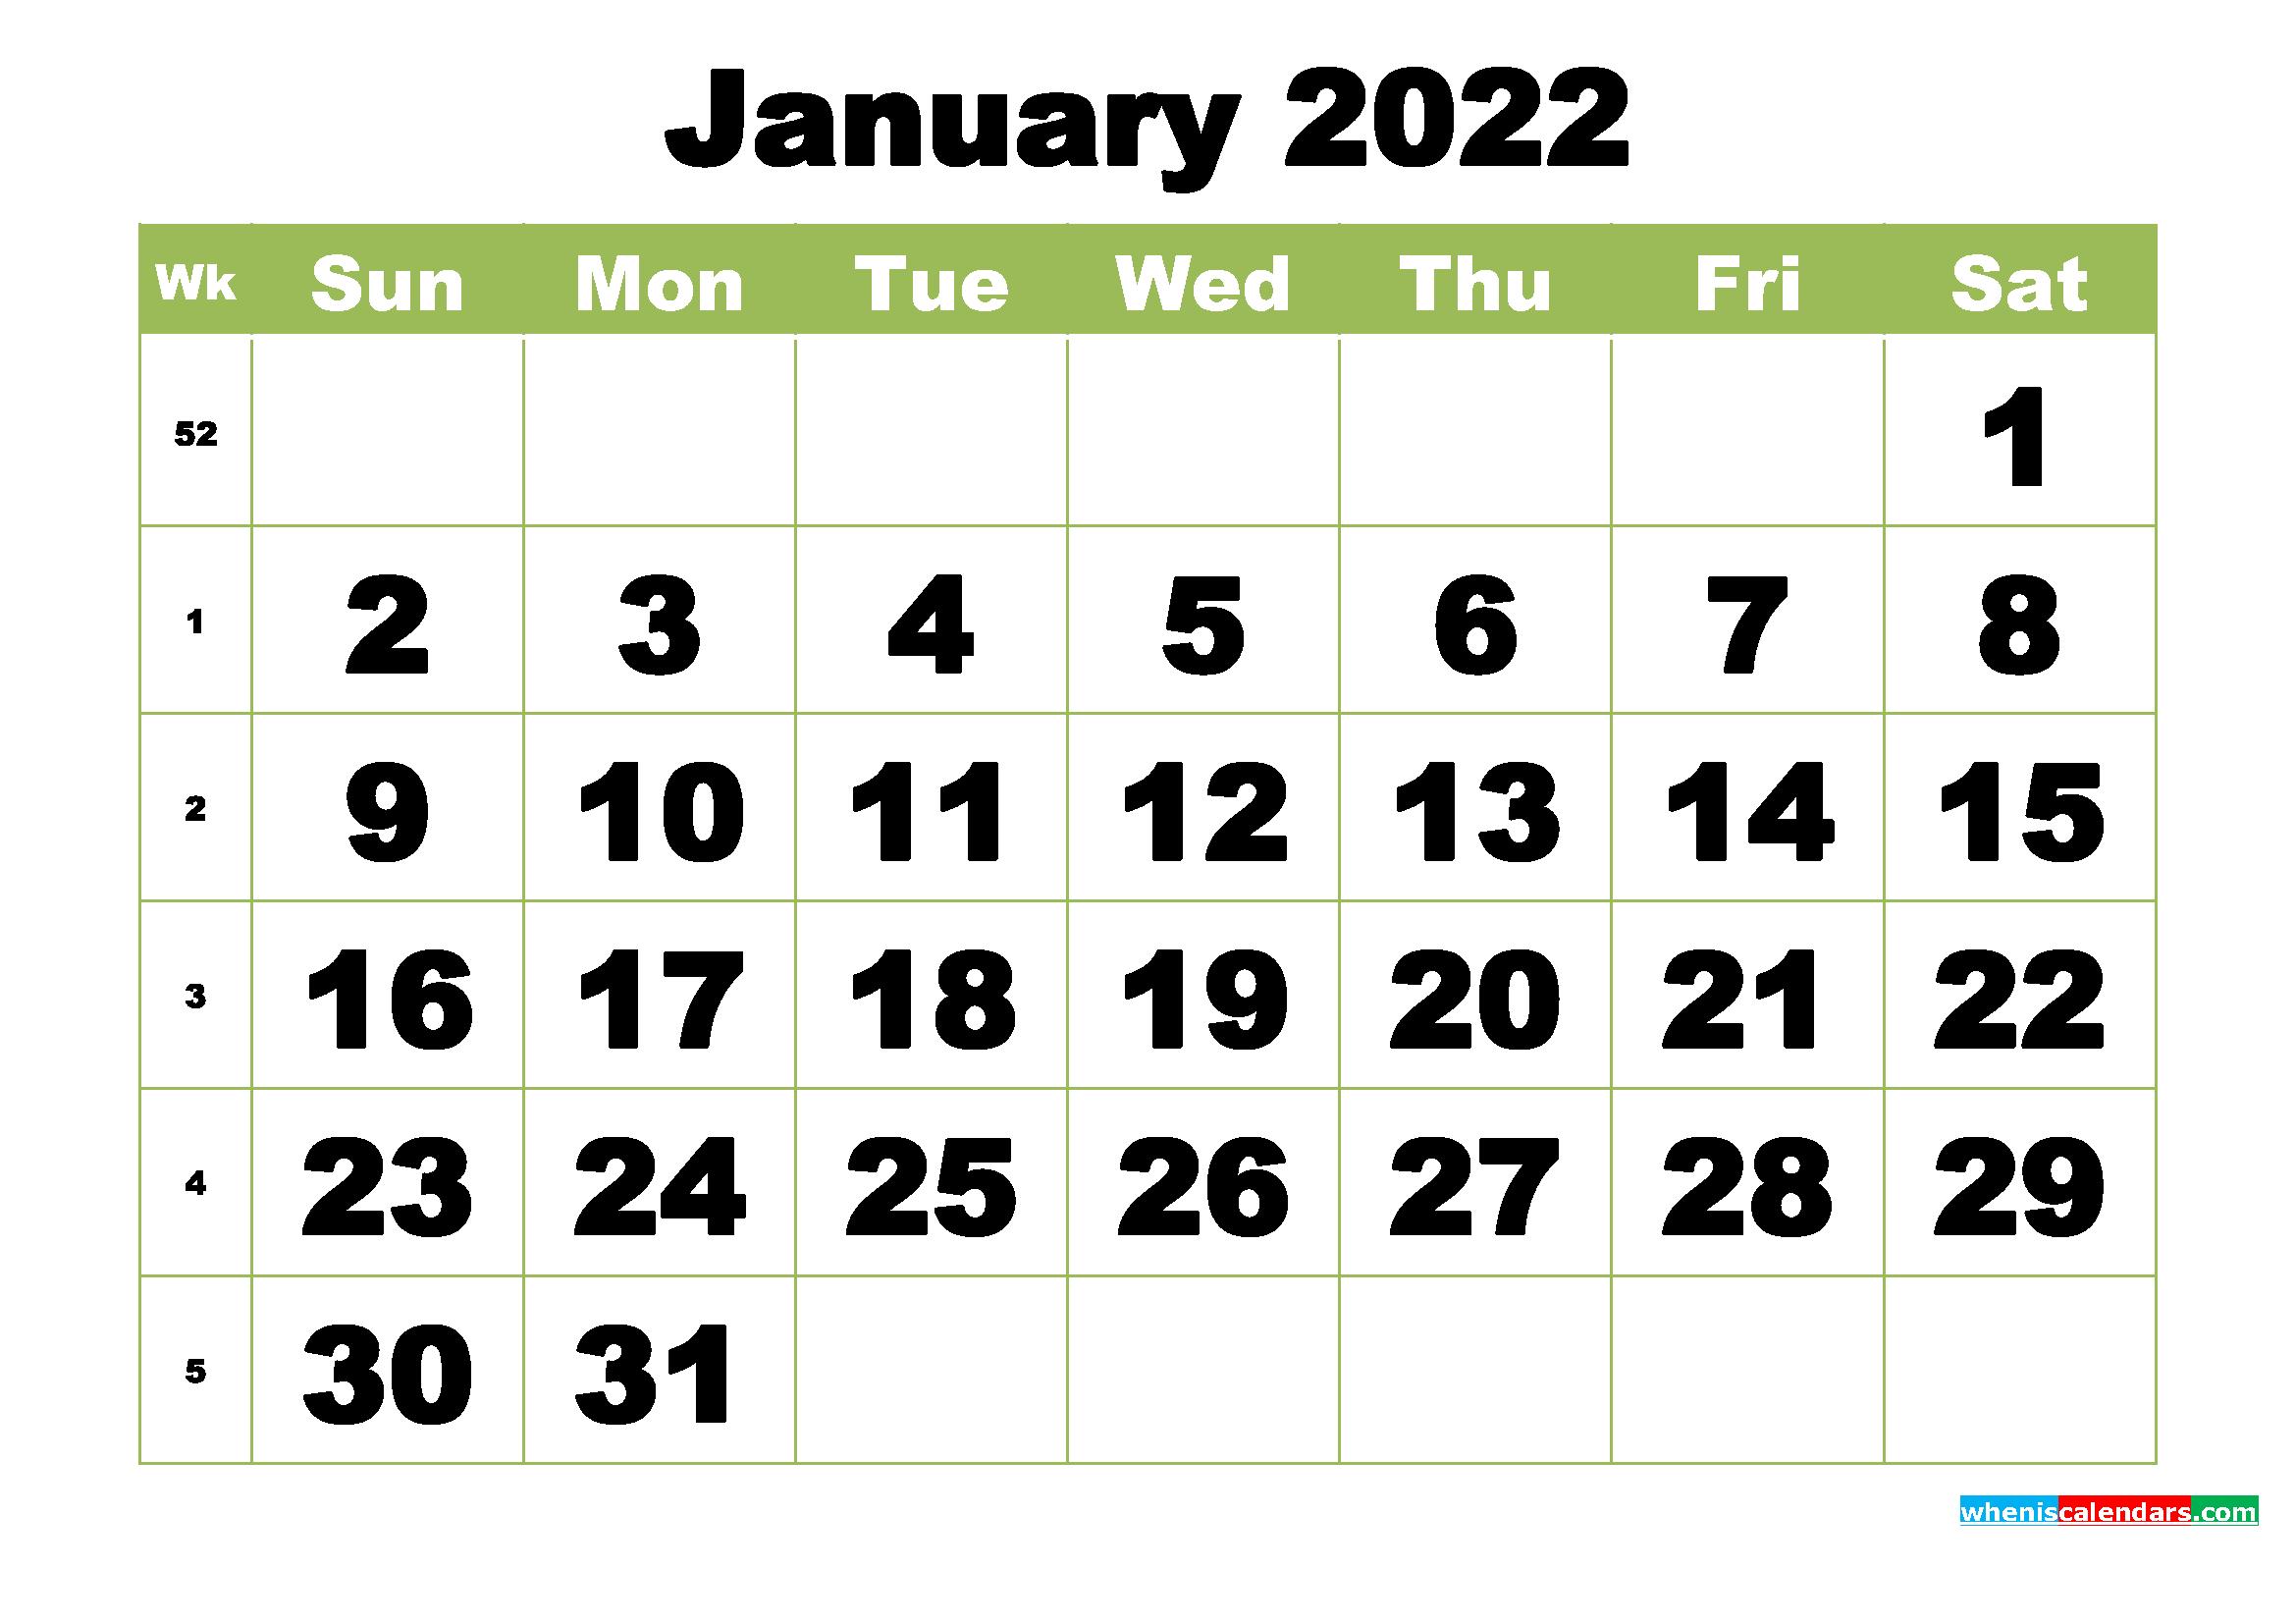 Free Printable Monthly Calendar January 2022 - Free Throughout Blank Calendar January 2022 Printable